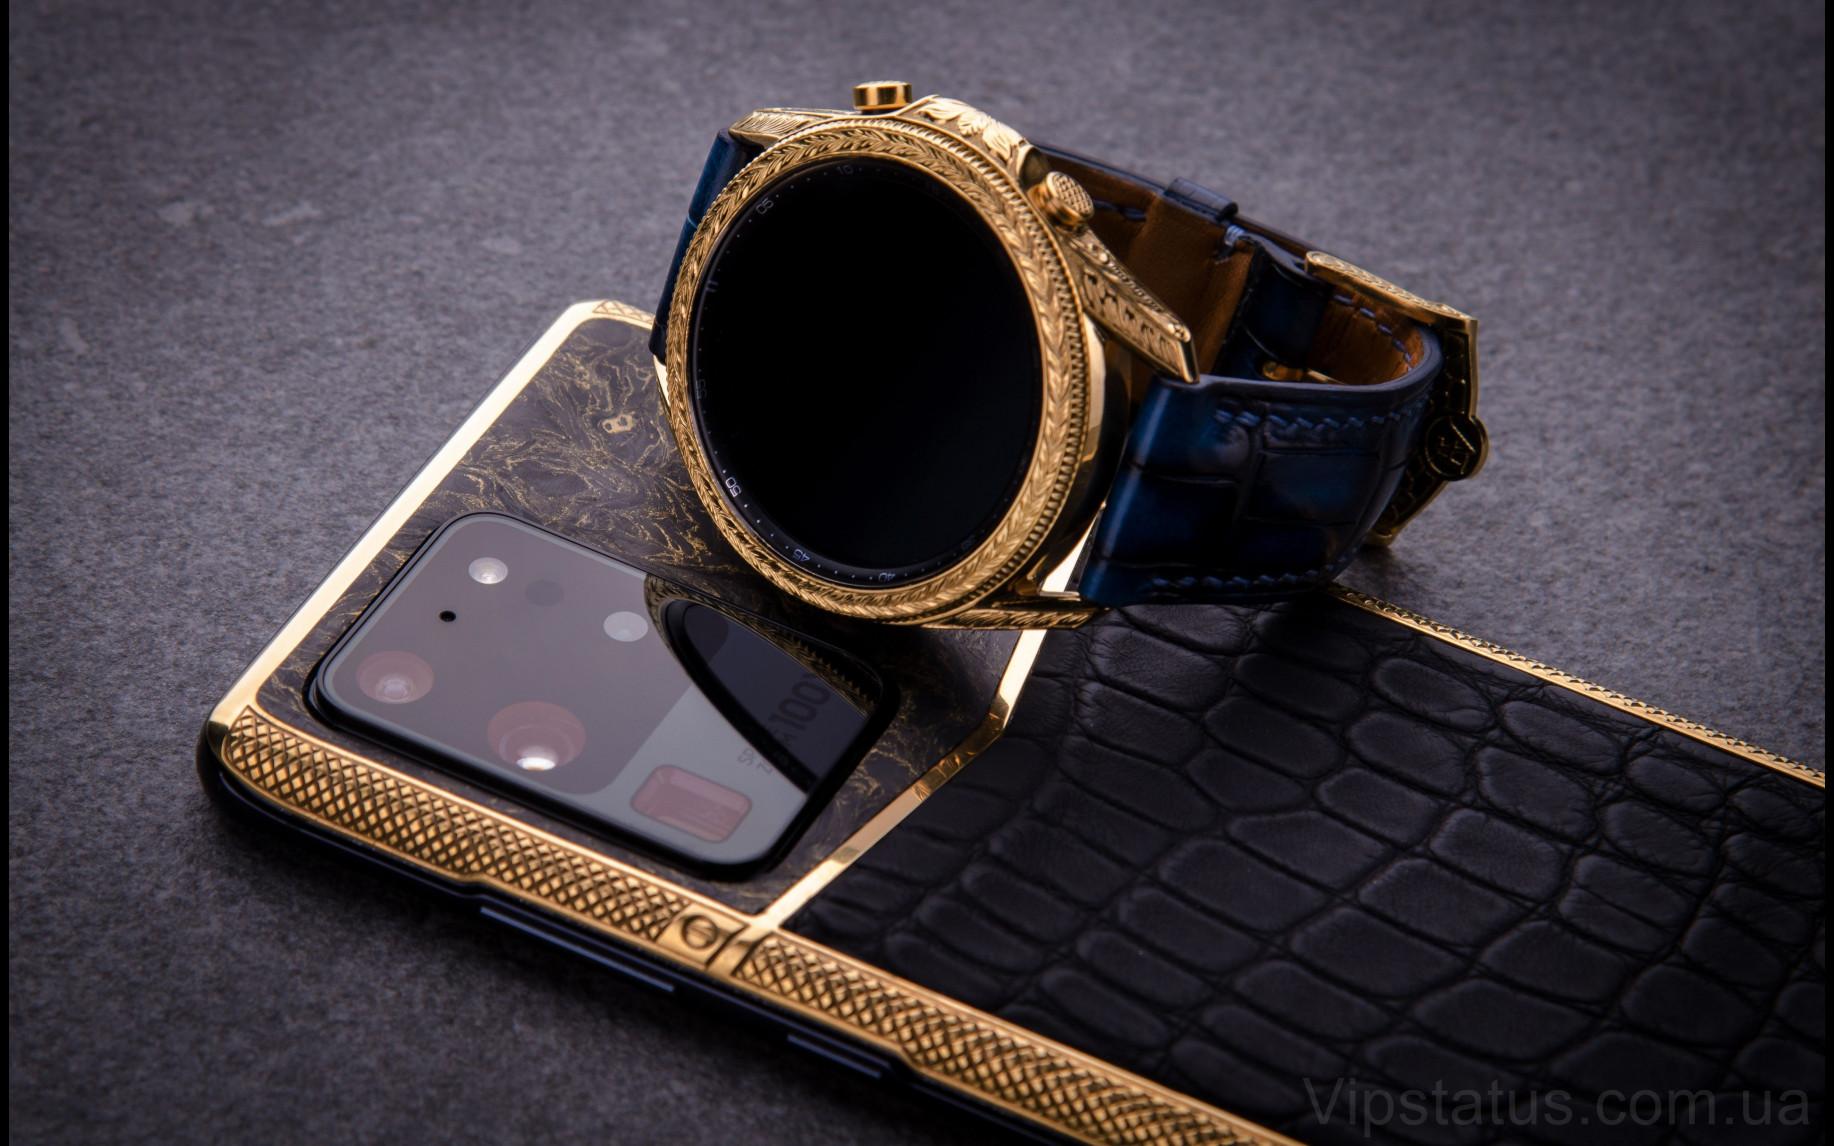 Elite Samsung S20 Gold Star Samsung S20 Gold Star image 8